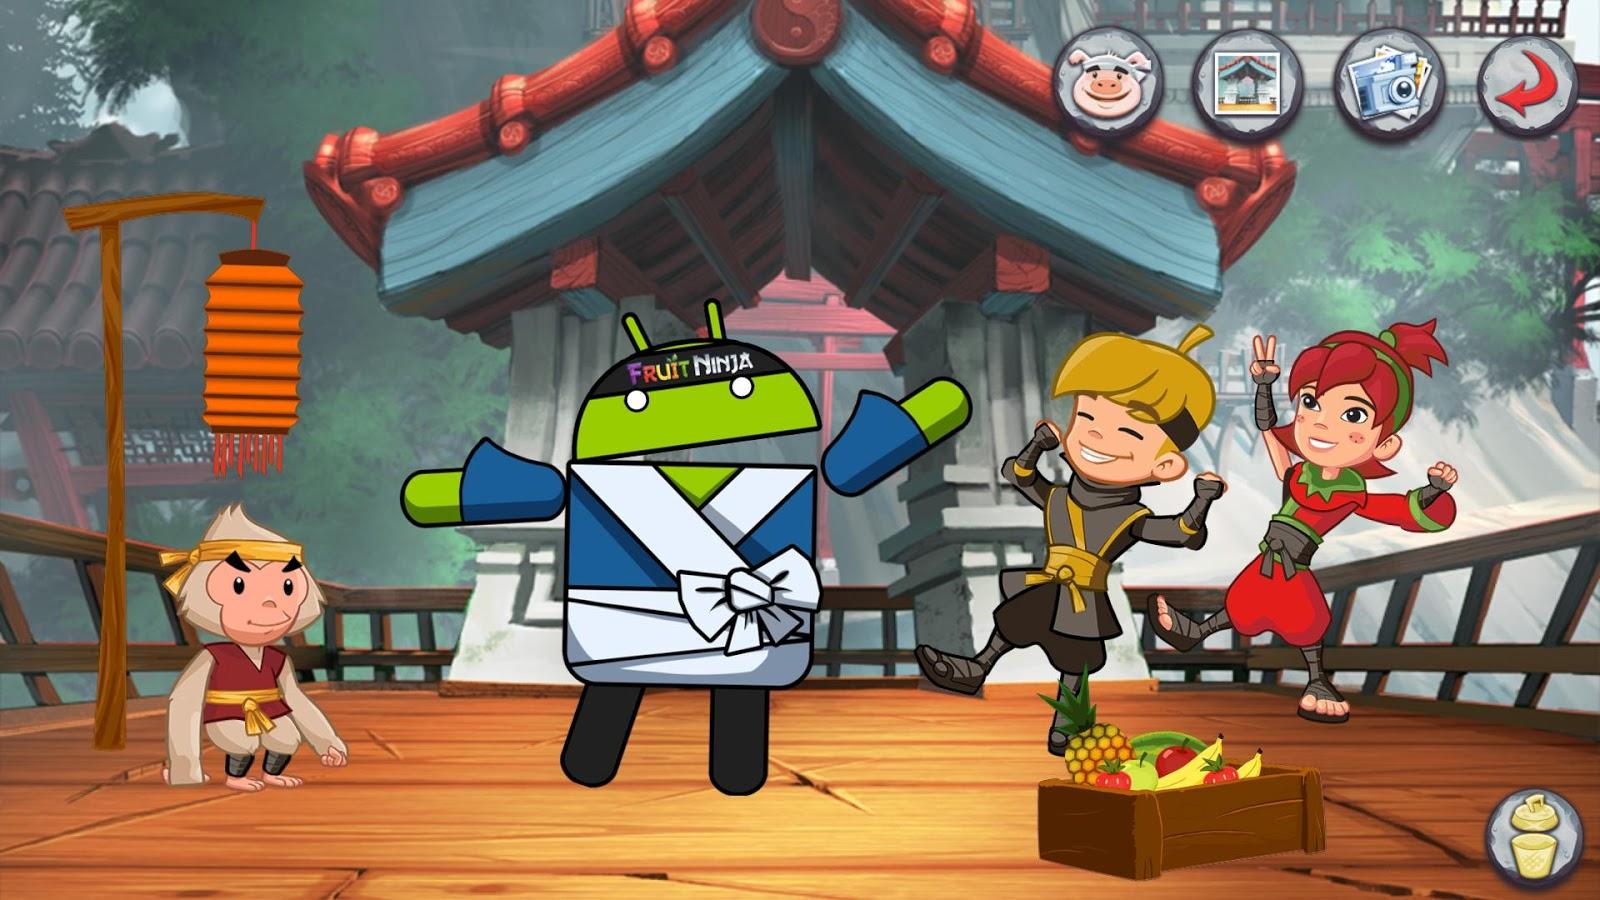 Fruit ninja free game - Fruit Ninja Math Master Screenshot